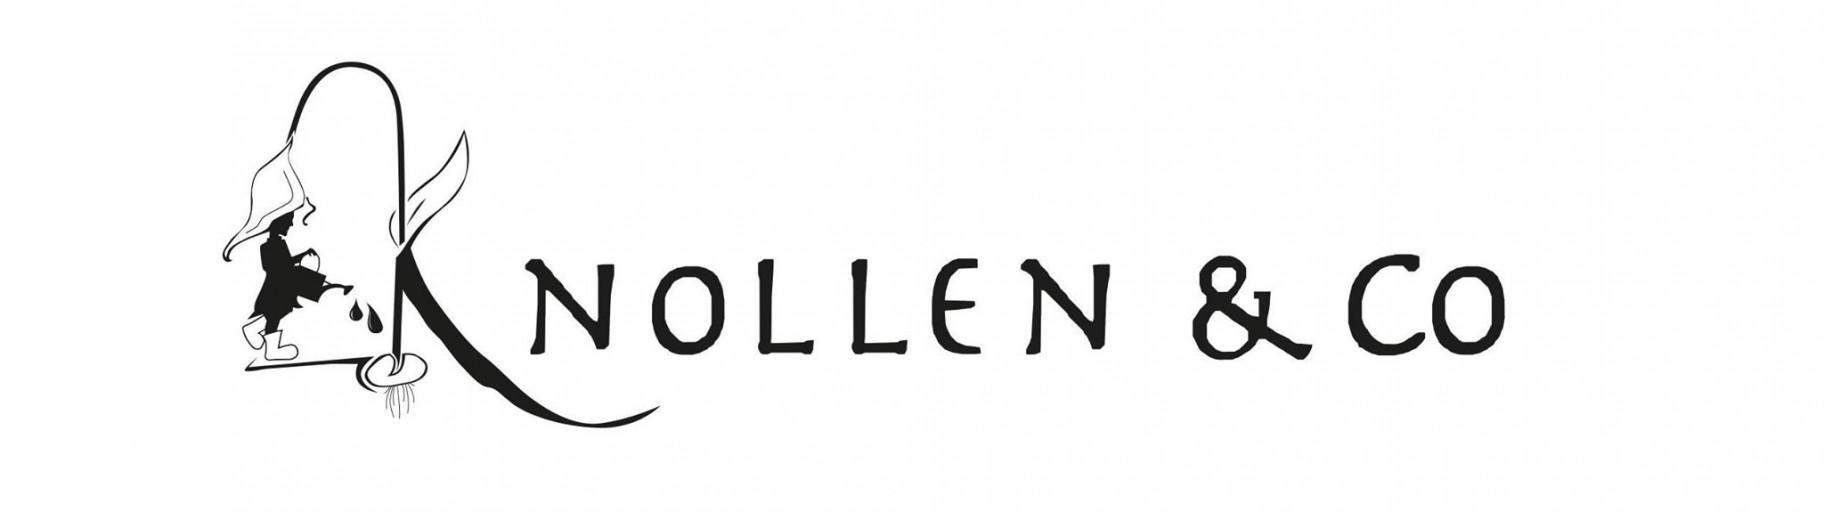 Knollen & Co e.V.